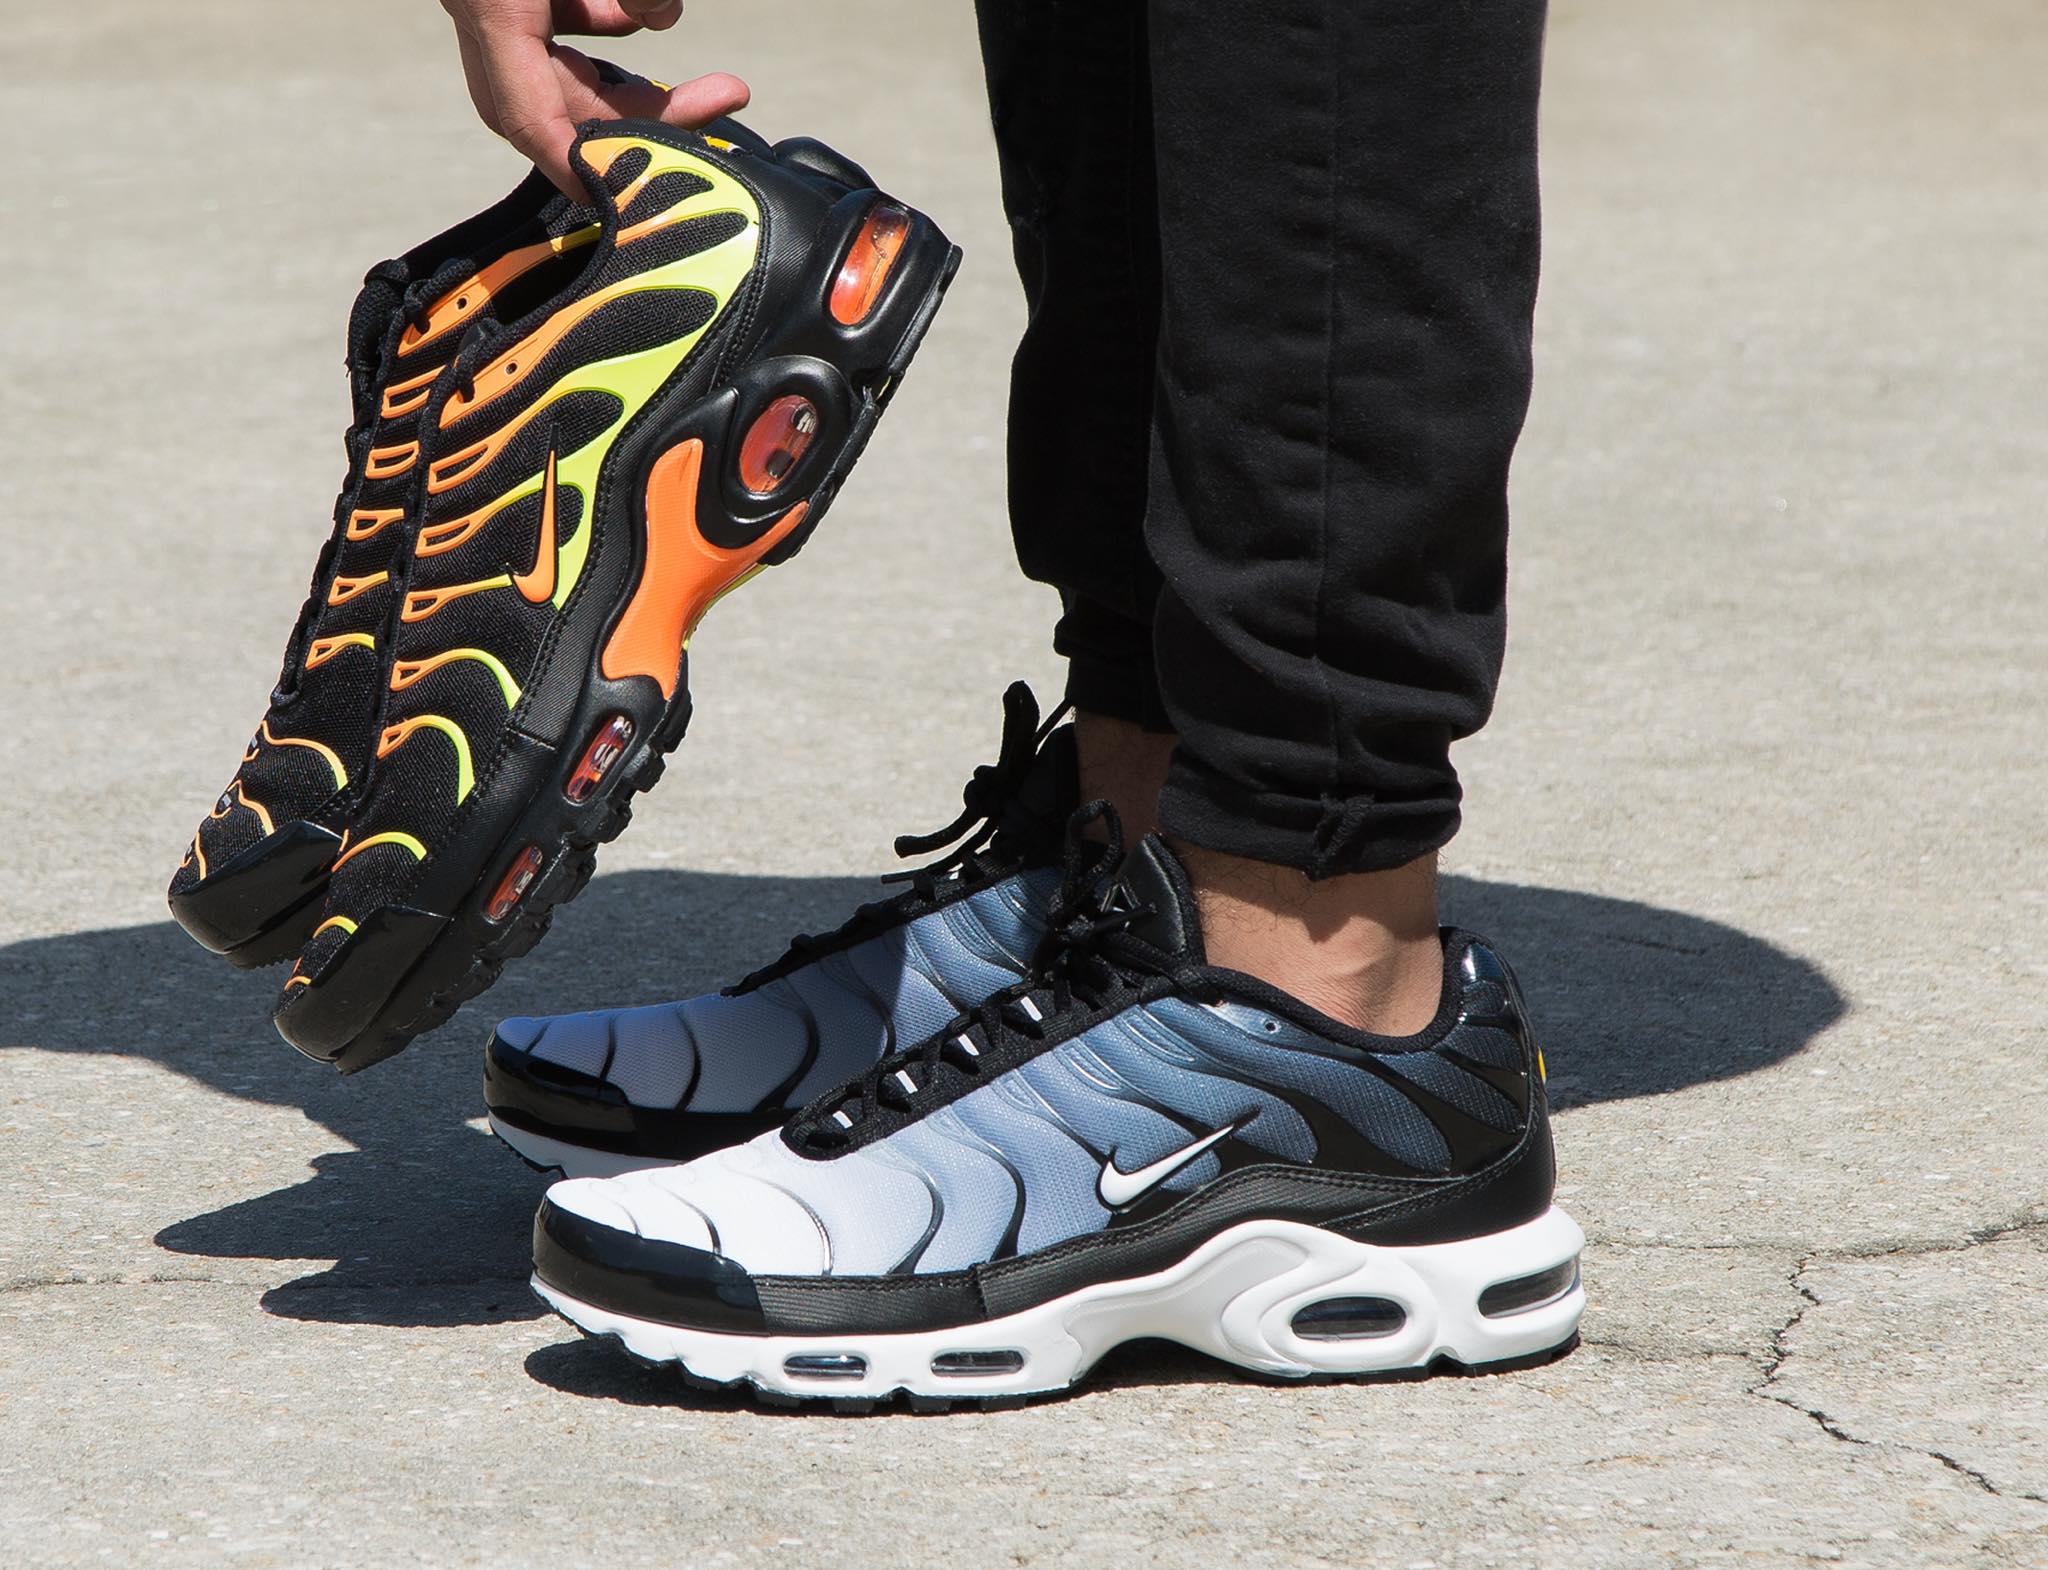 buy popular 191b5 54915 ... sneaker freaker ba48a 872a1  best price nike air max plus black volt  orange bc693 cc7b6